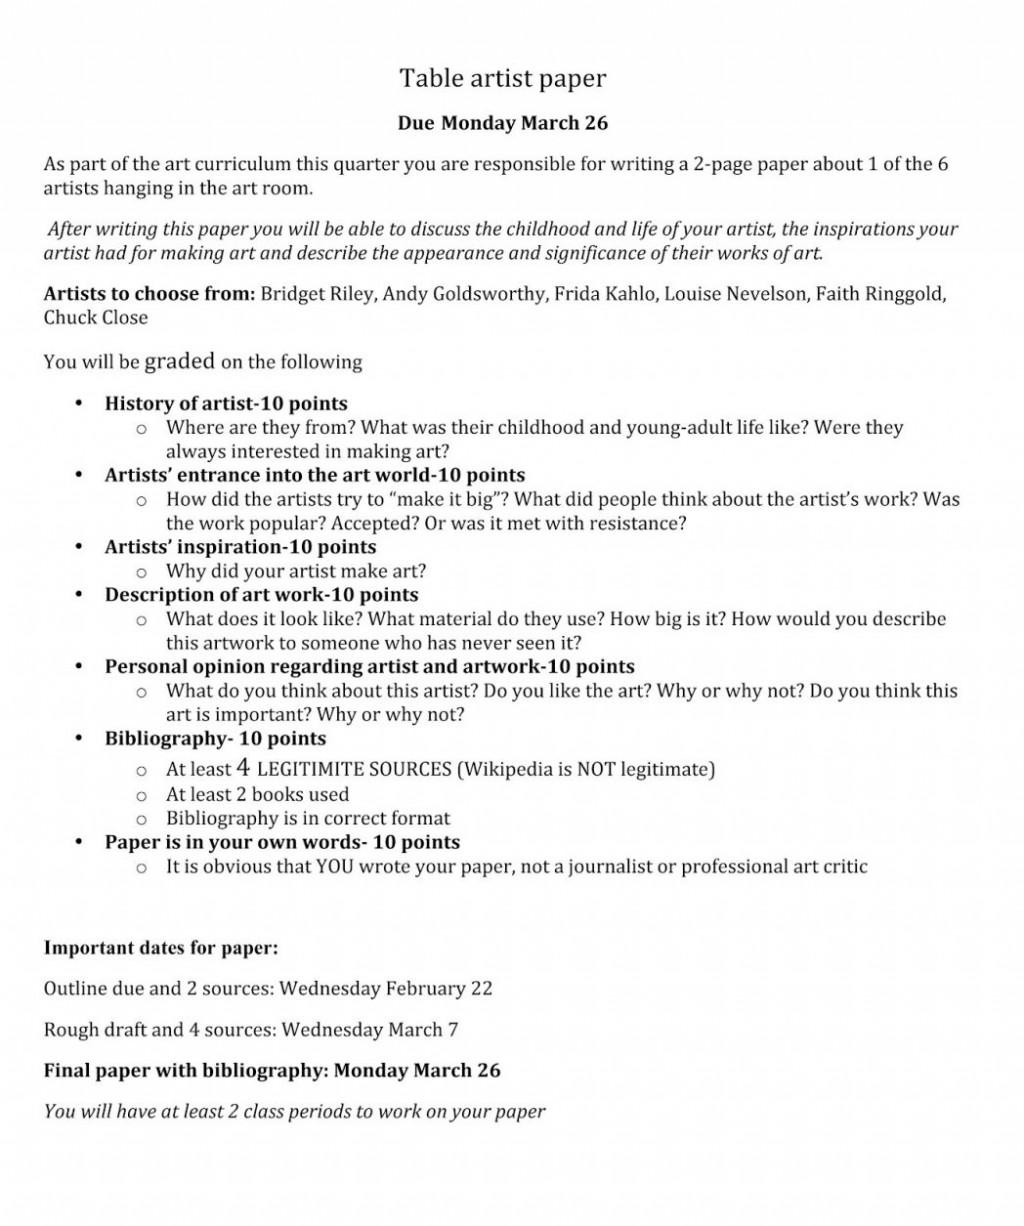 013 Art Essays College Papi Ip Hi History Metropolitan Museum Of Application Performing Arts School Culinary Liberal Martial 1048x1255 Formidable Essay Examples Conclusion A2 Large